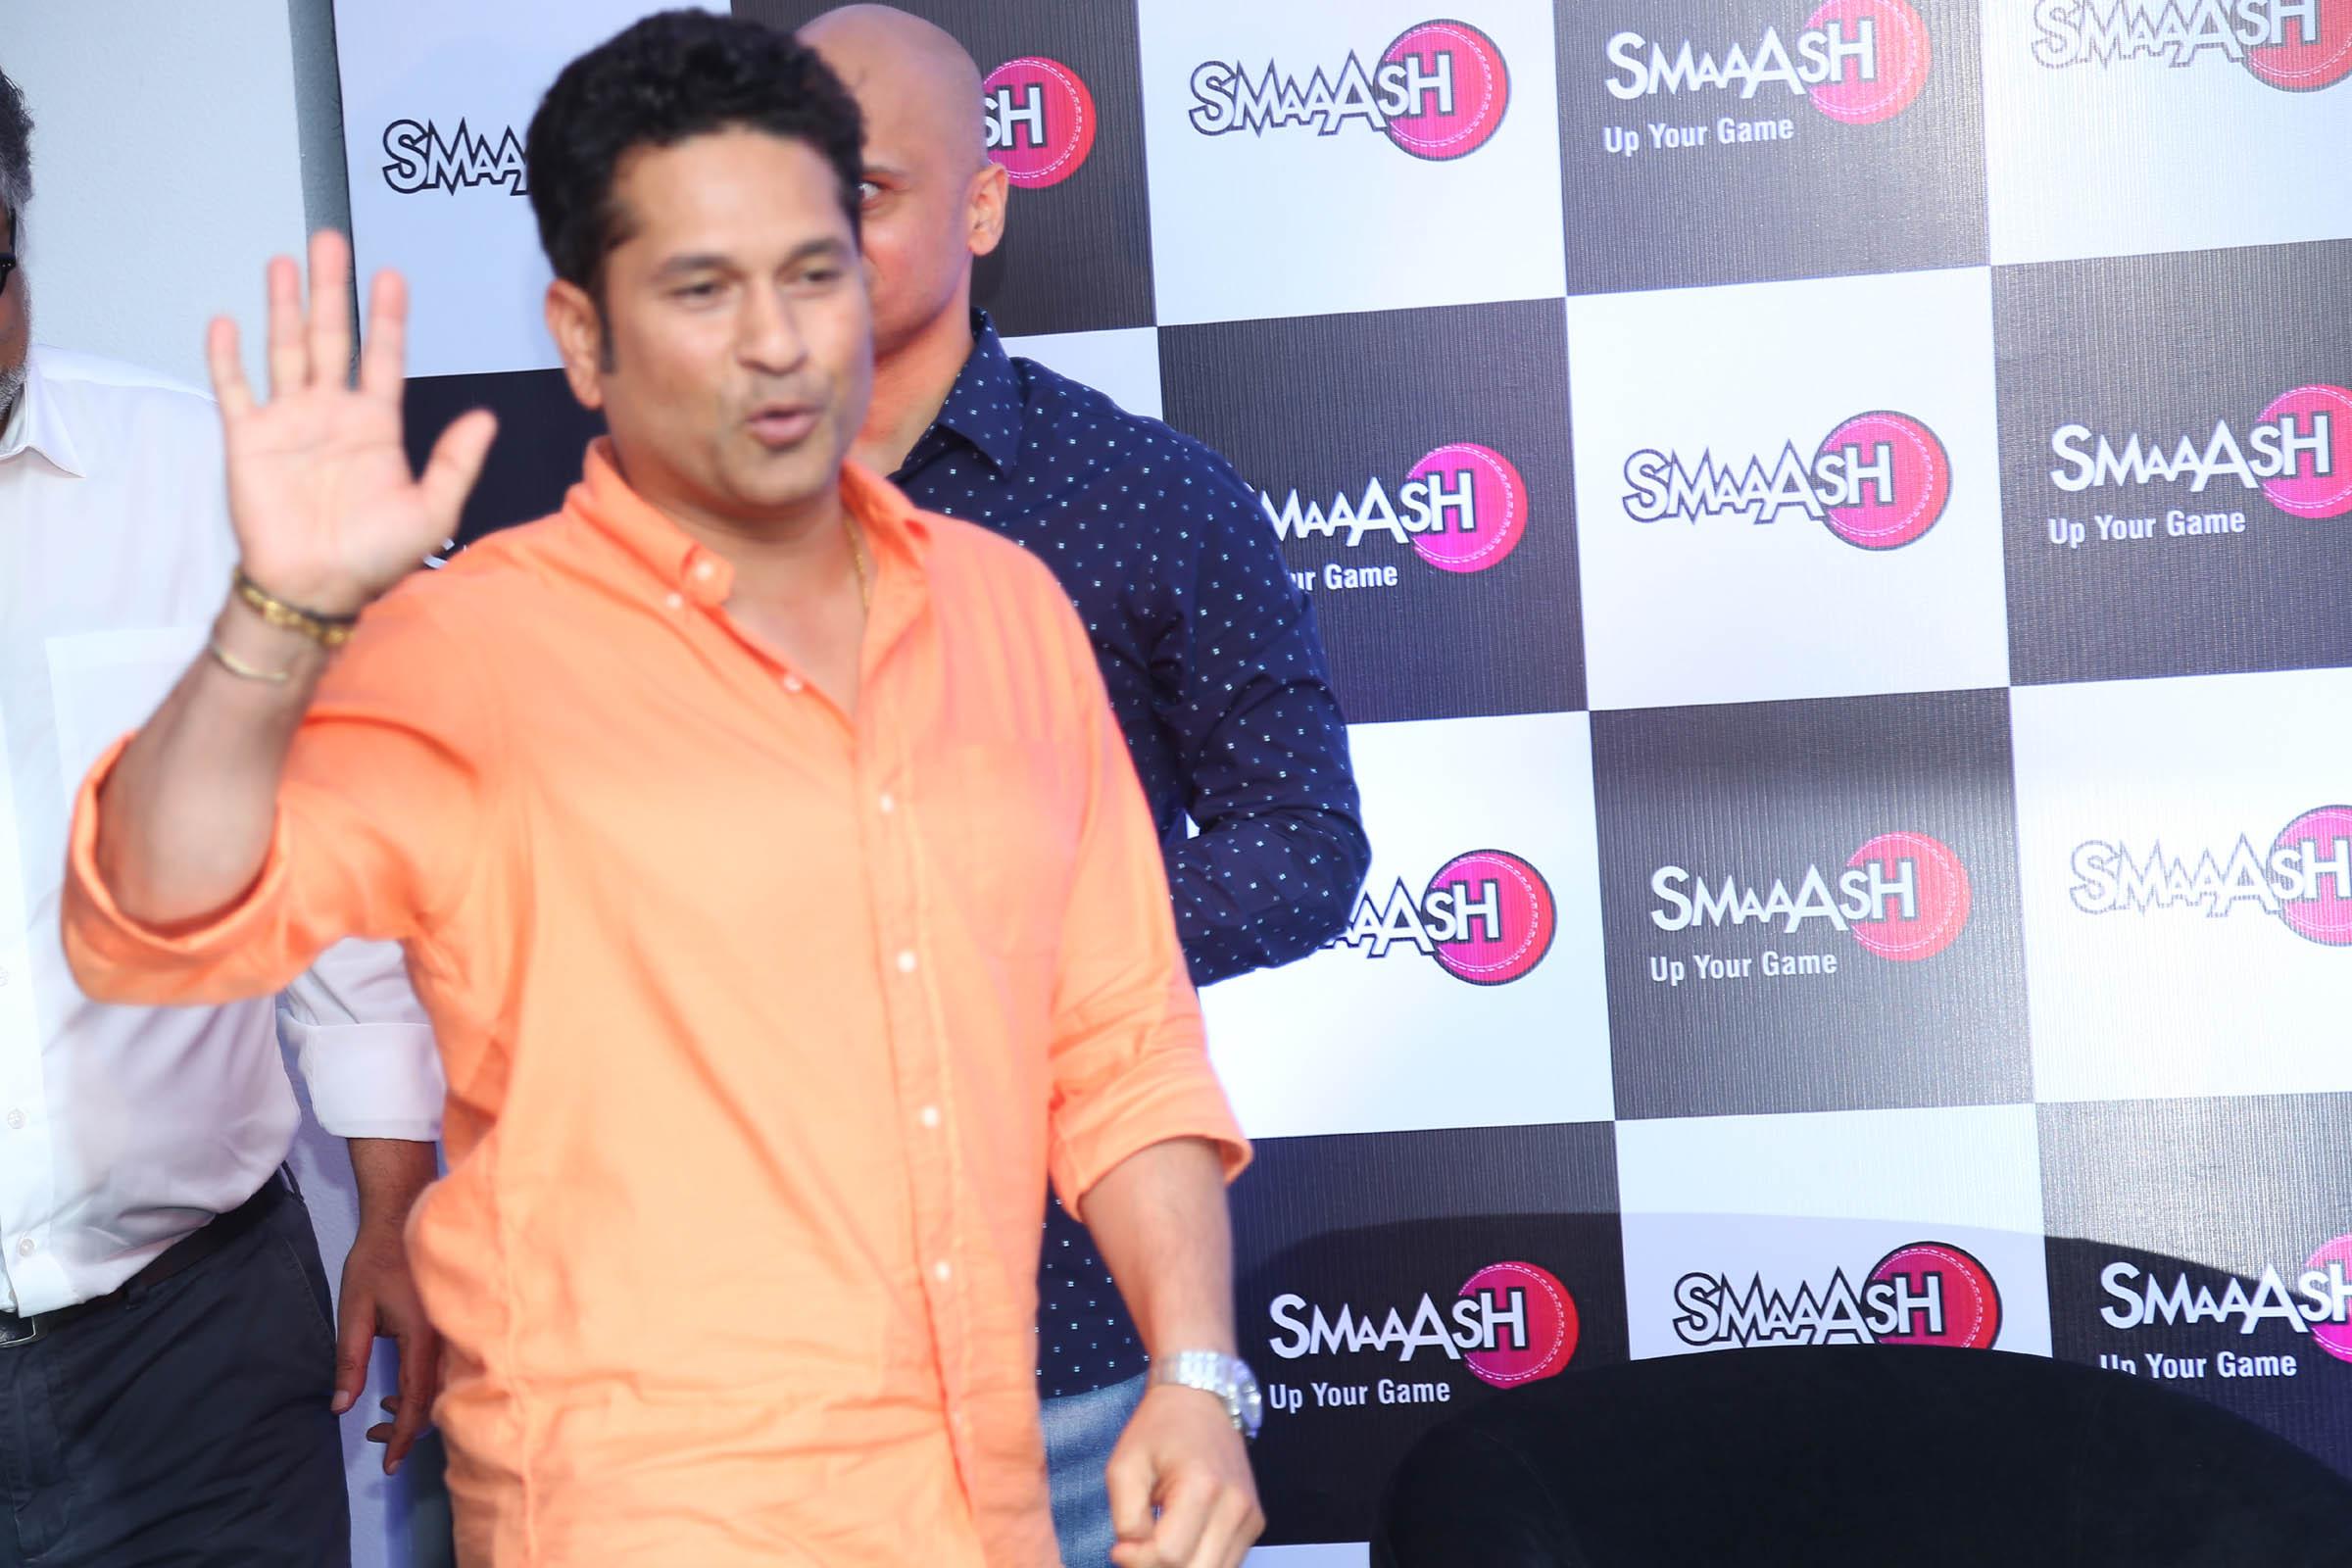 Sachin Tendulkar at the launch event